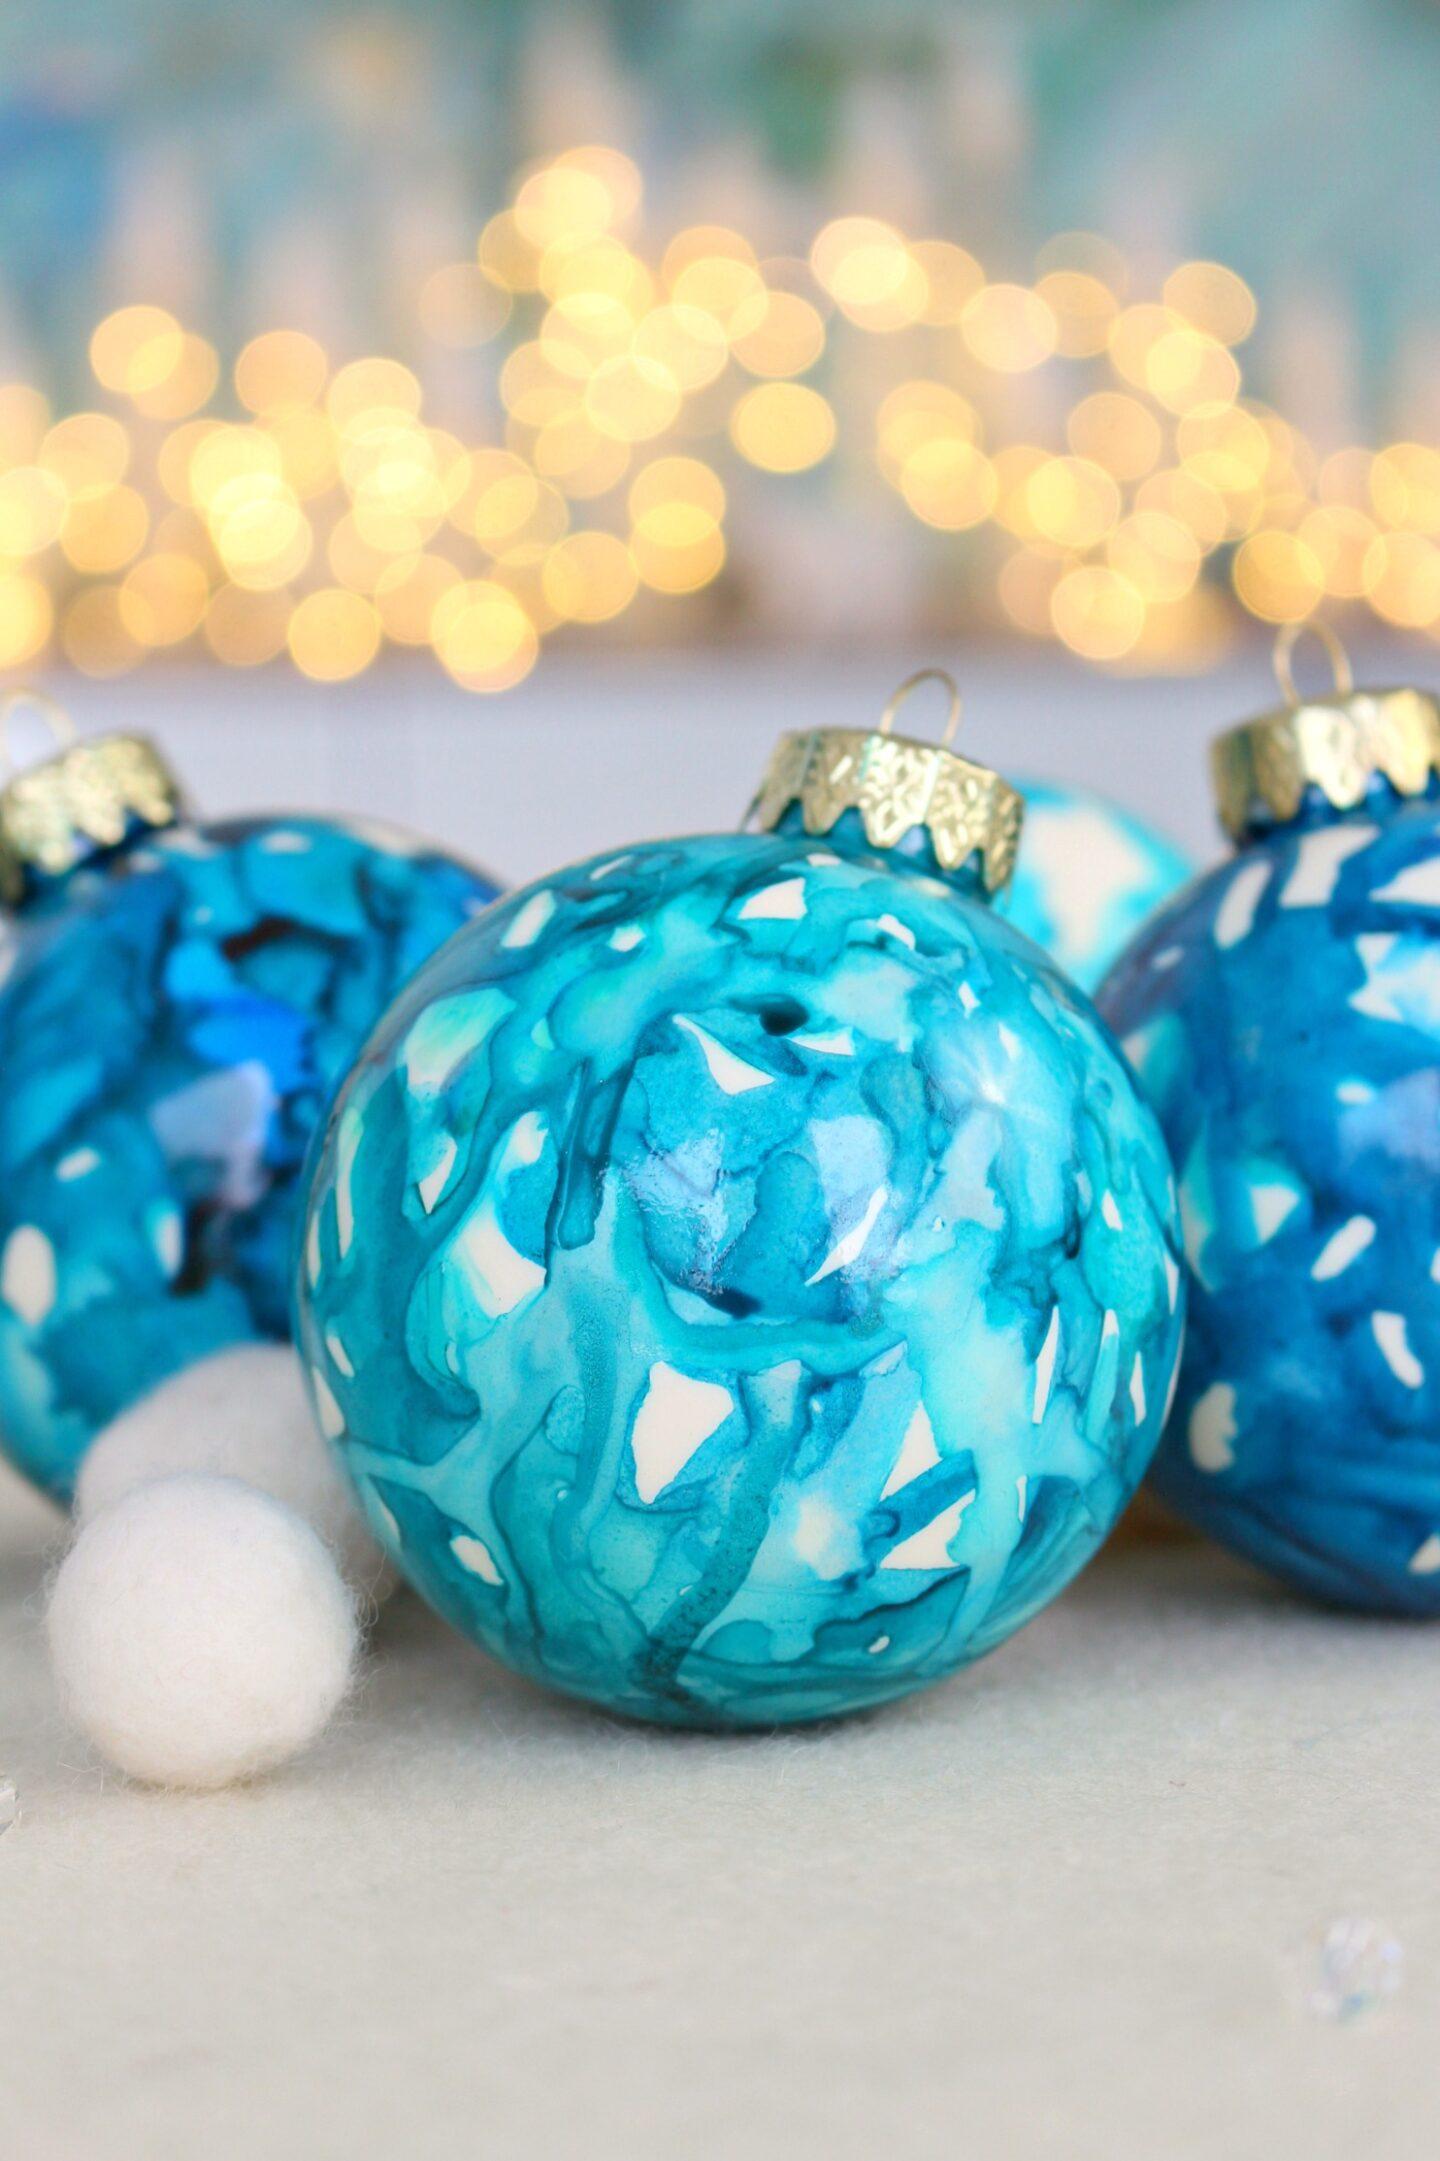 DIY Alcohol Ink Christmas Ornament Tutorial